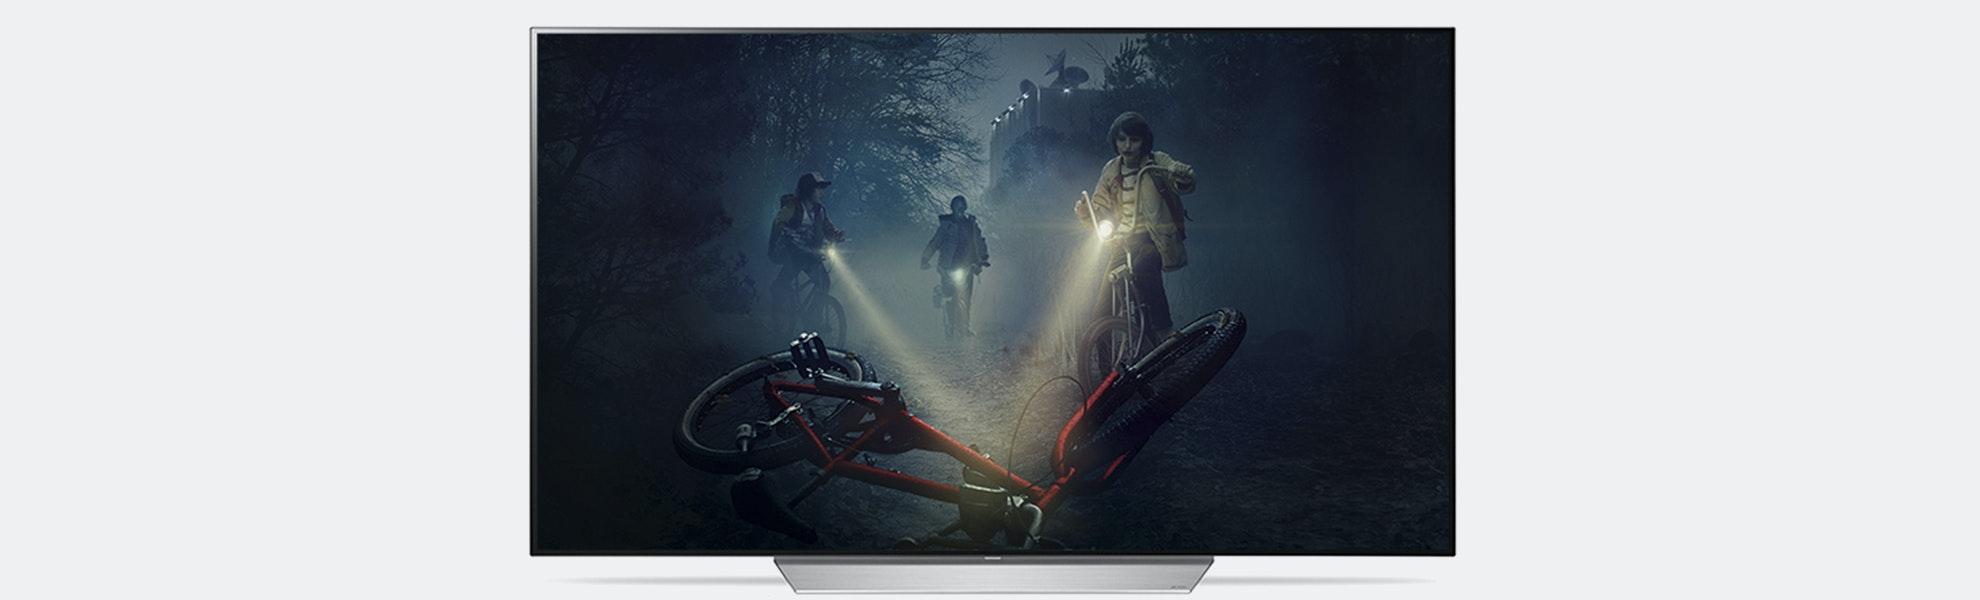 "LG 55"" C7P OLED 4K HDR Smart TV"